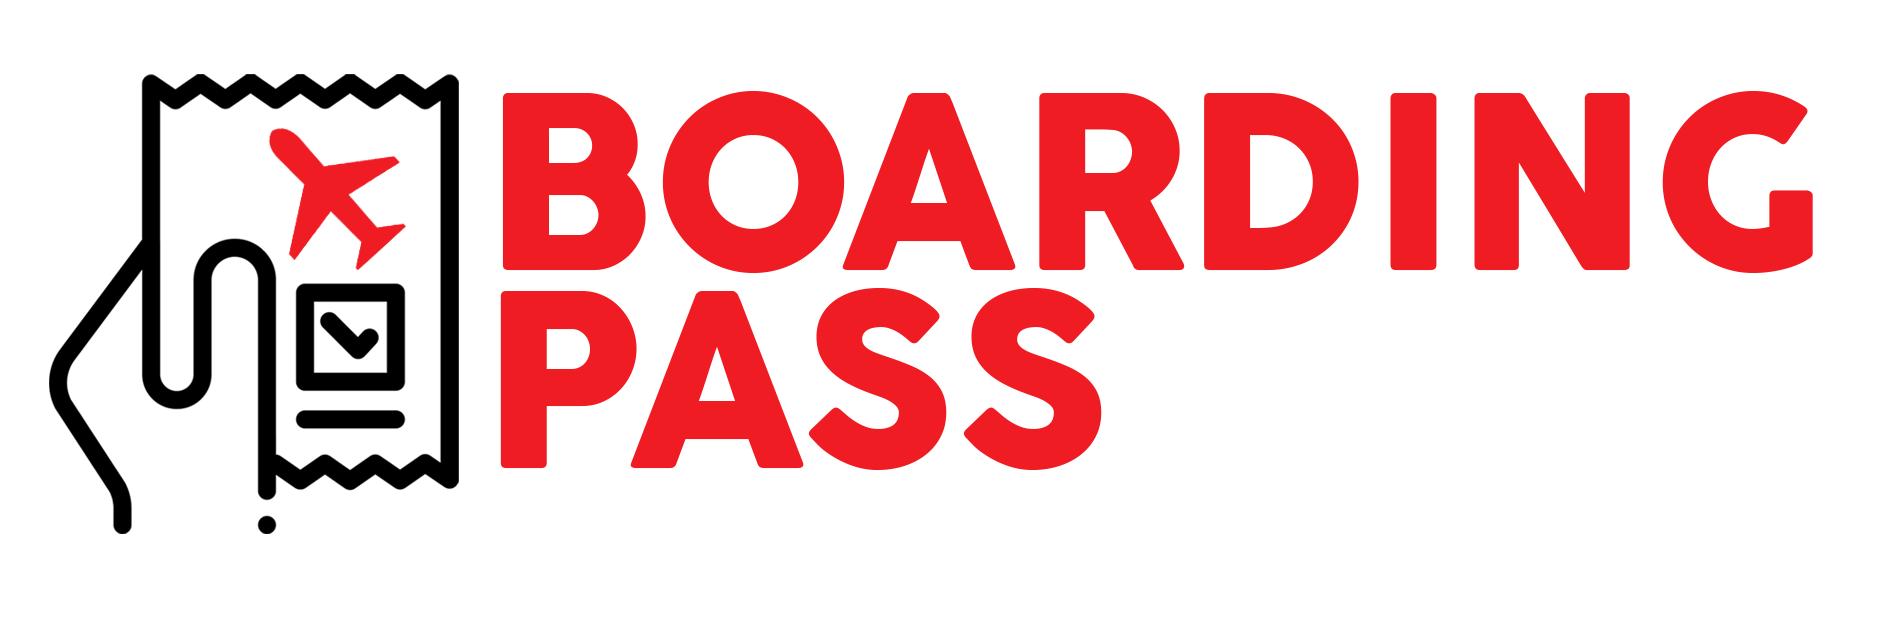 BoardingPass.ro